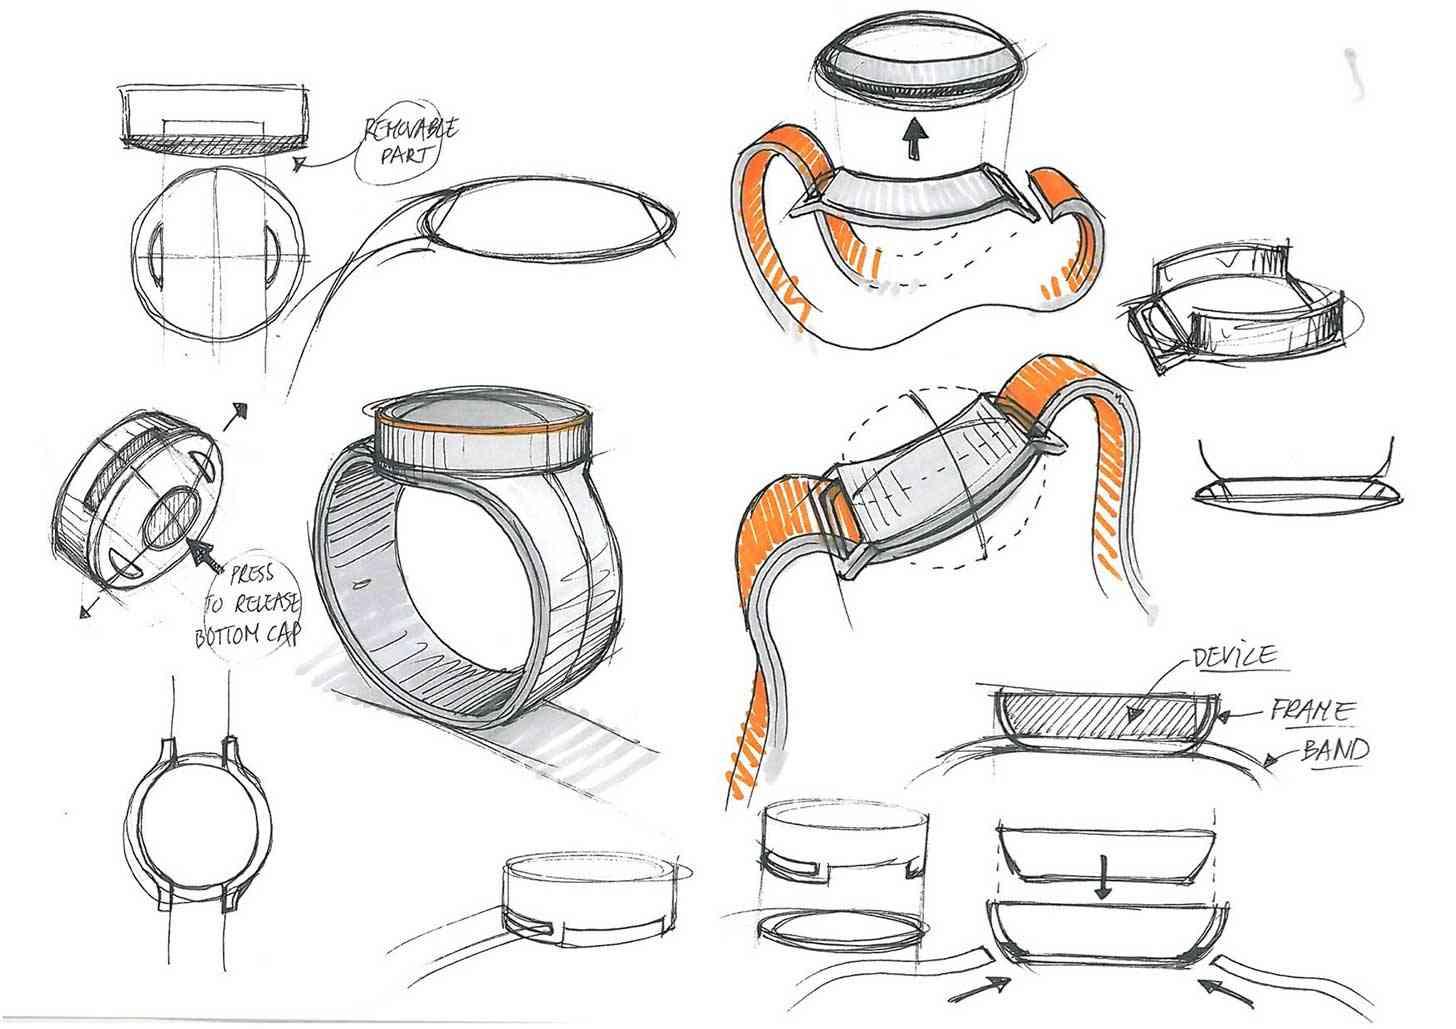 OnePlus Watch sketches